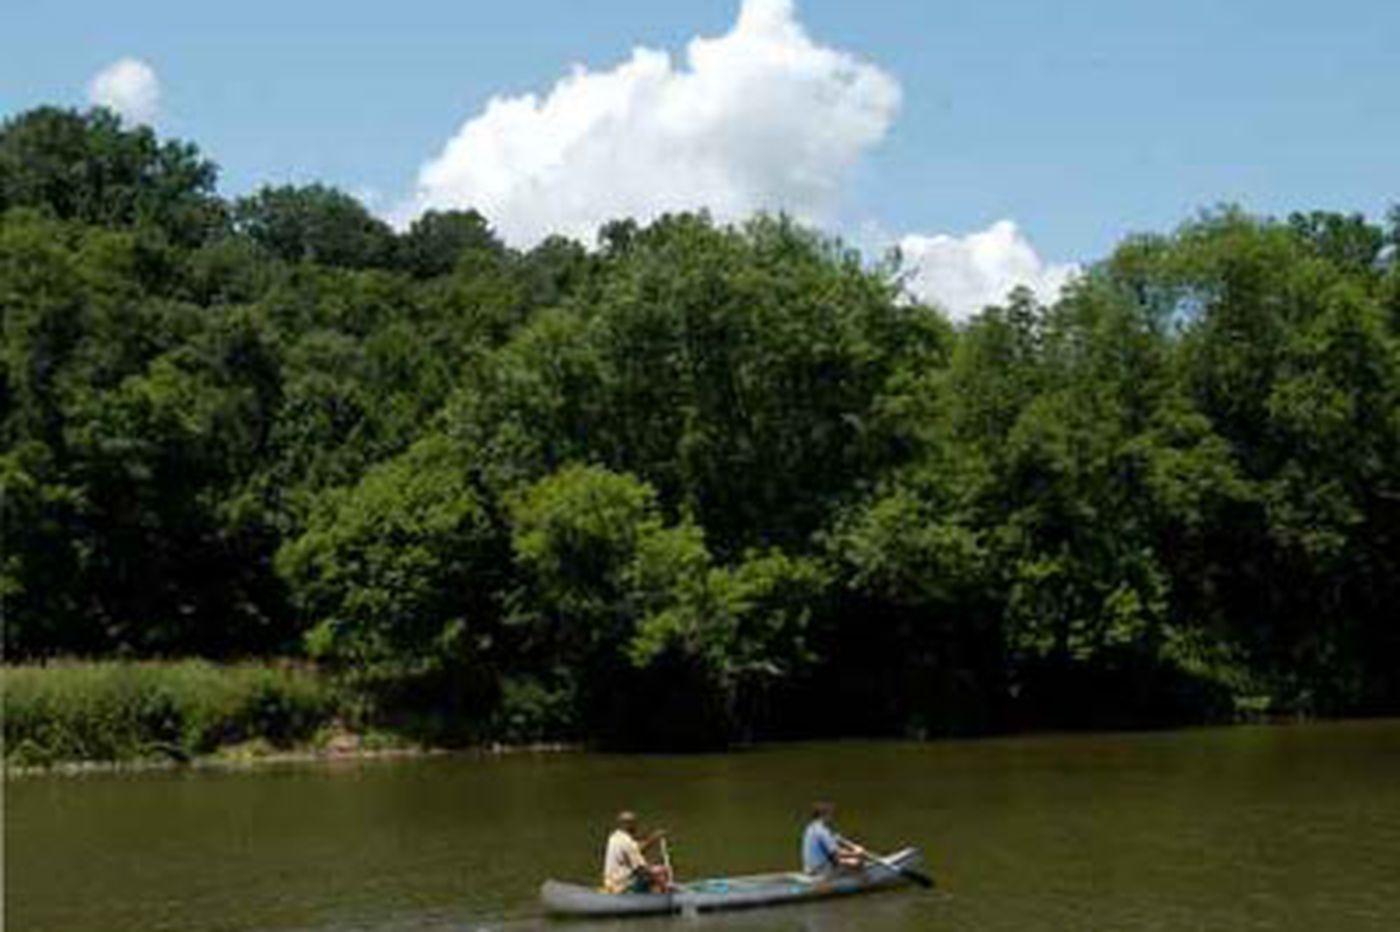 Bucks officials overturn gun ban in county parks